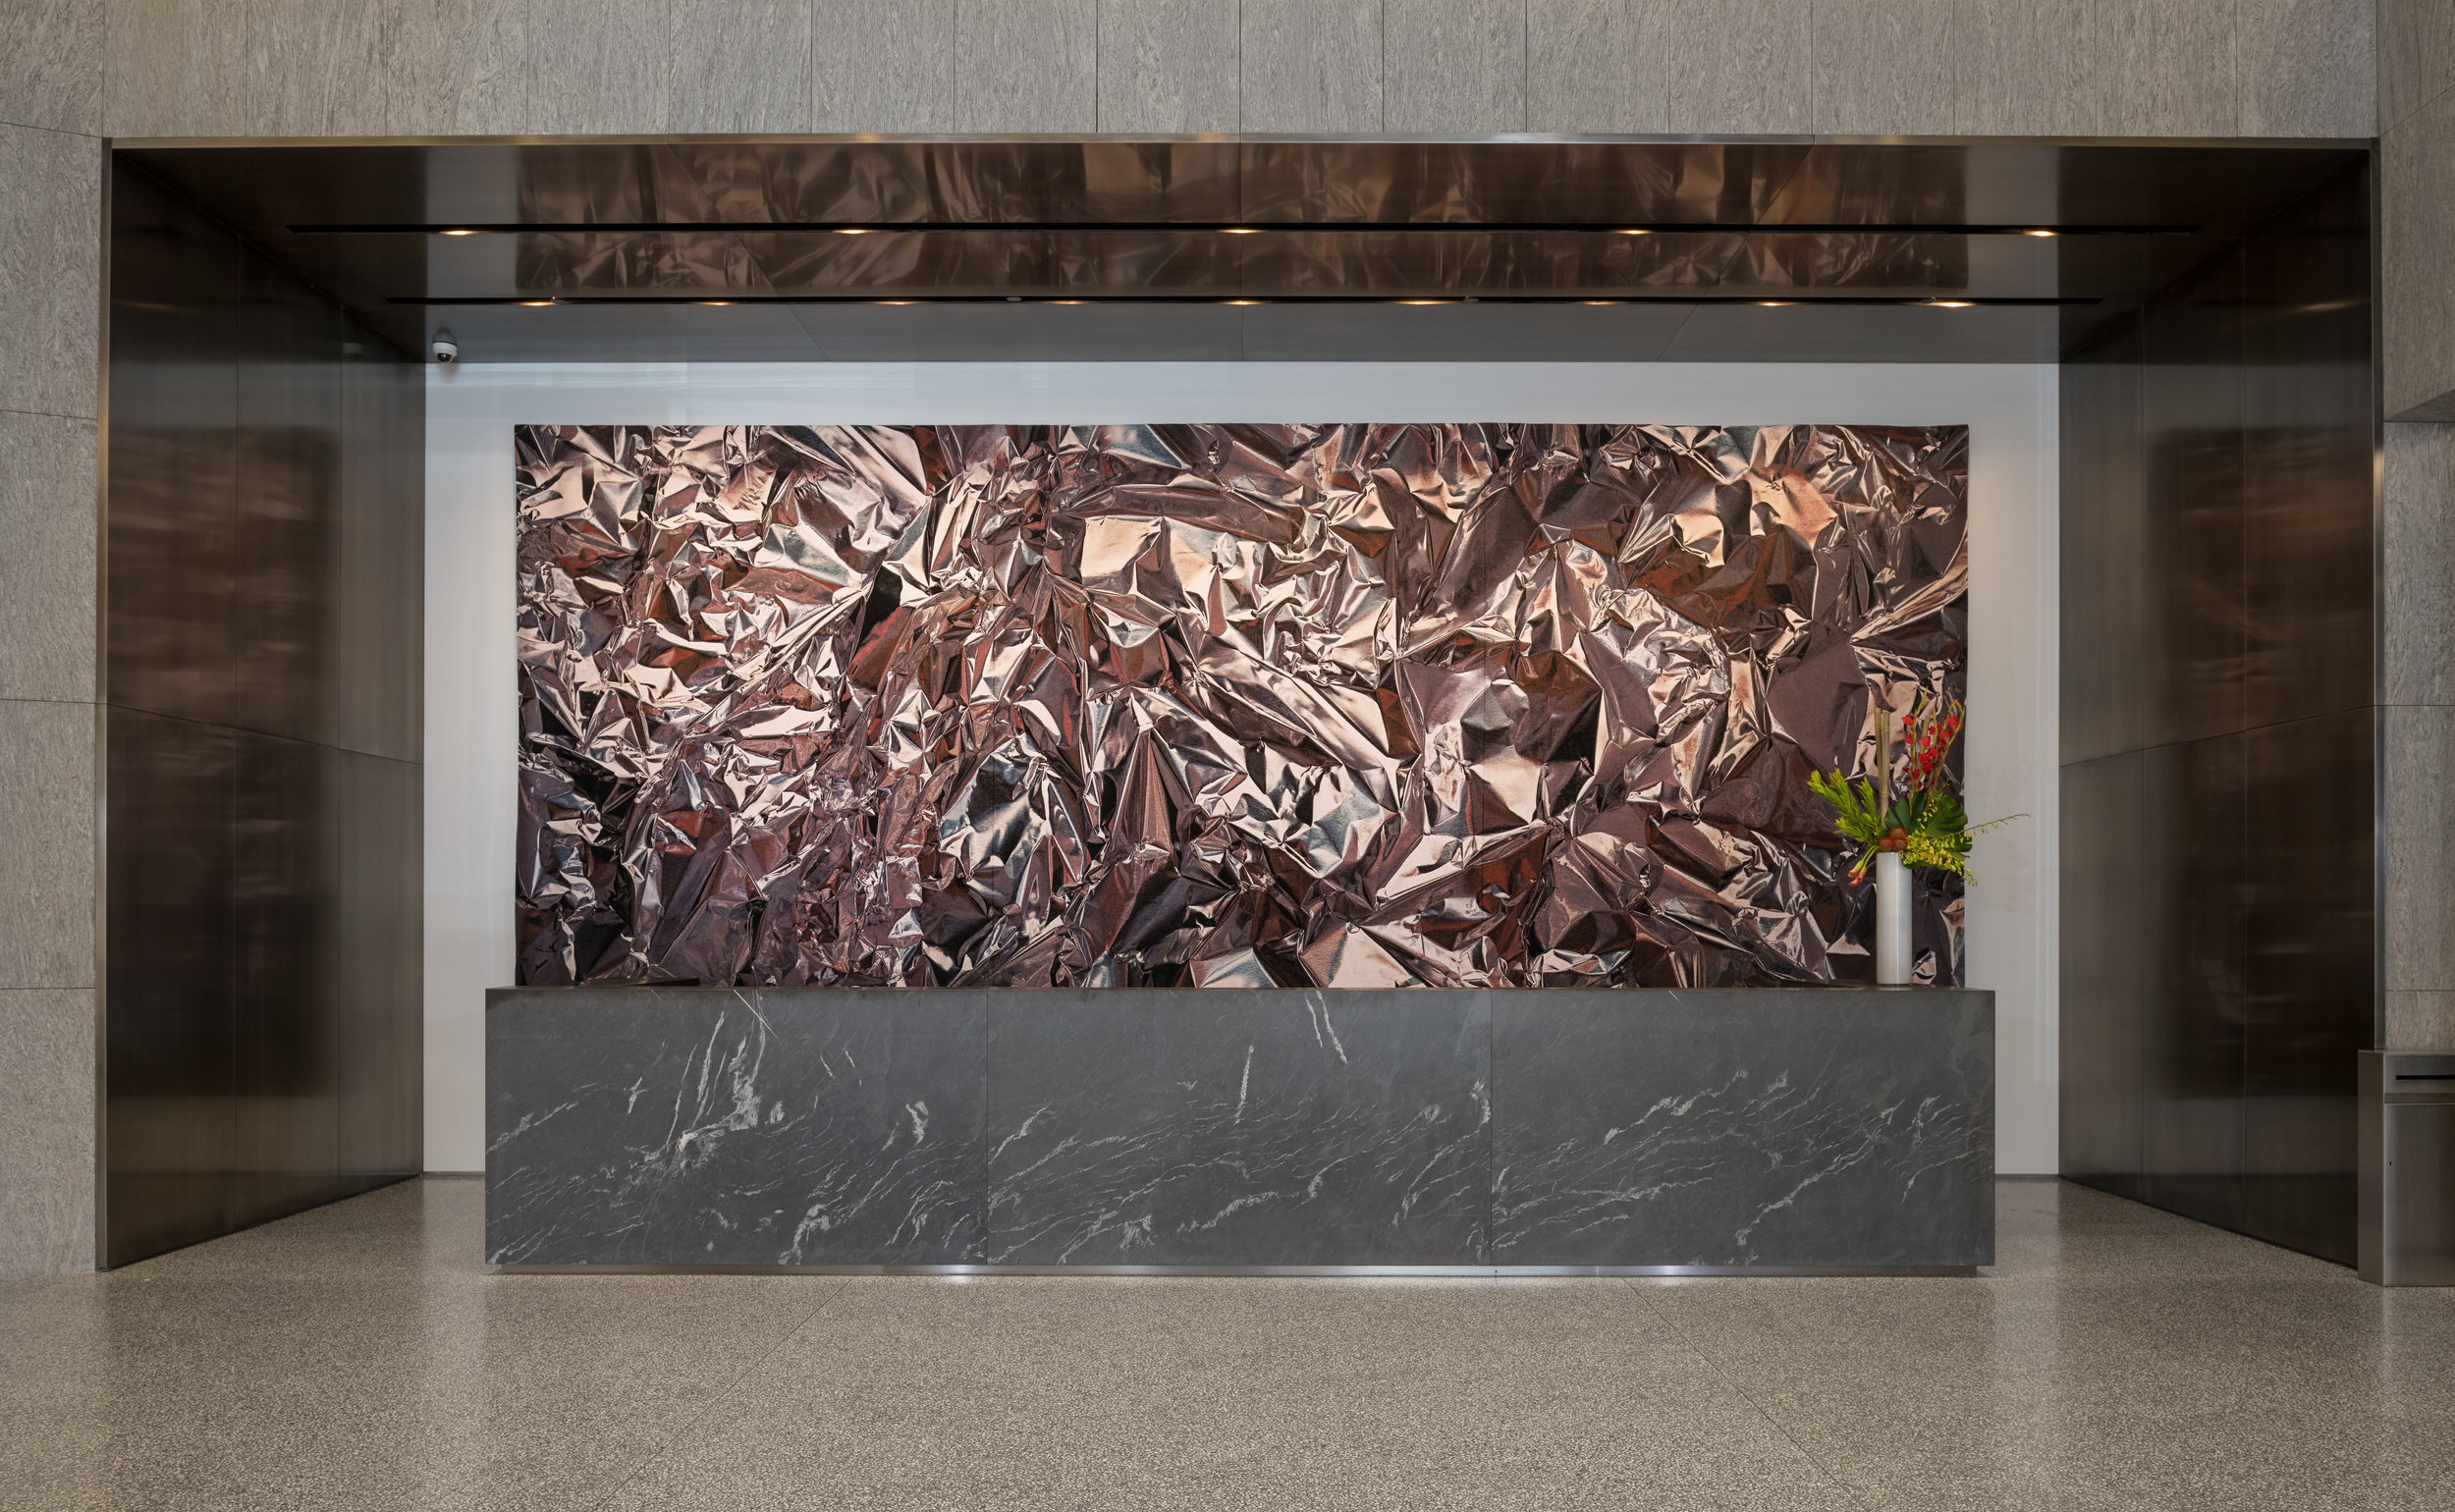 Artist: Pae White,  New Neighbors, REDDISH,  2018, Location: Washington, D.C.